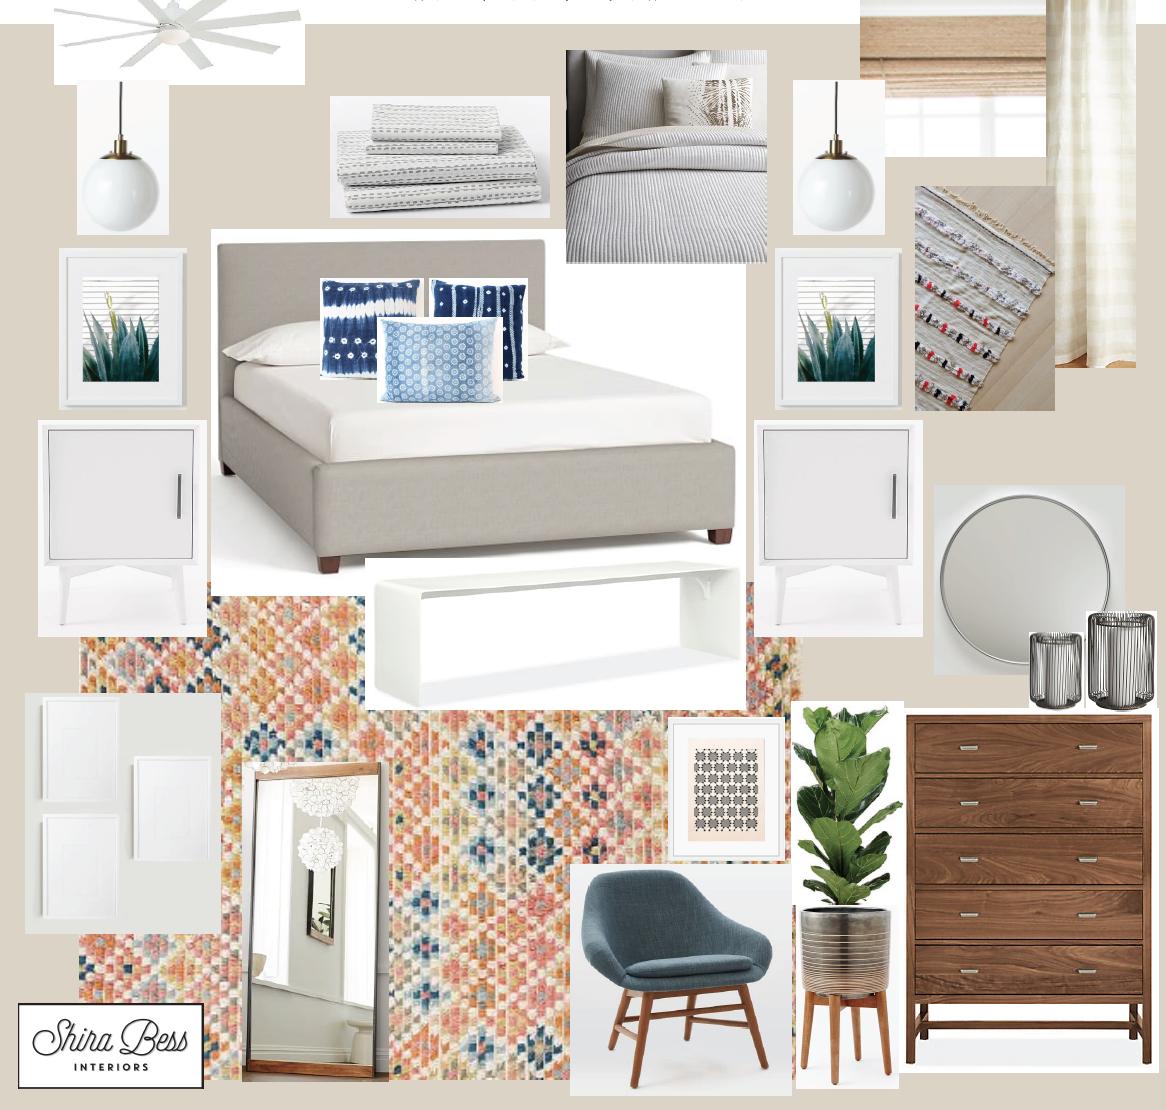 Naples Master Bedroom - Final Design